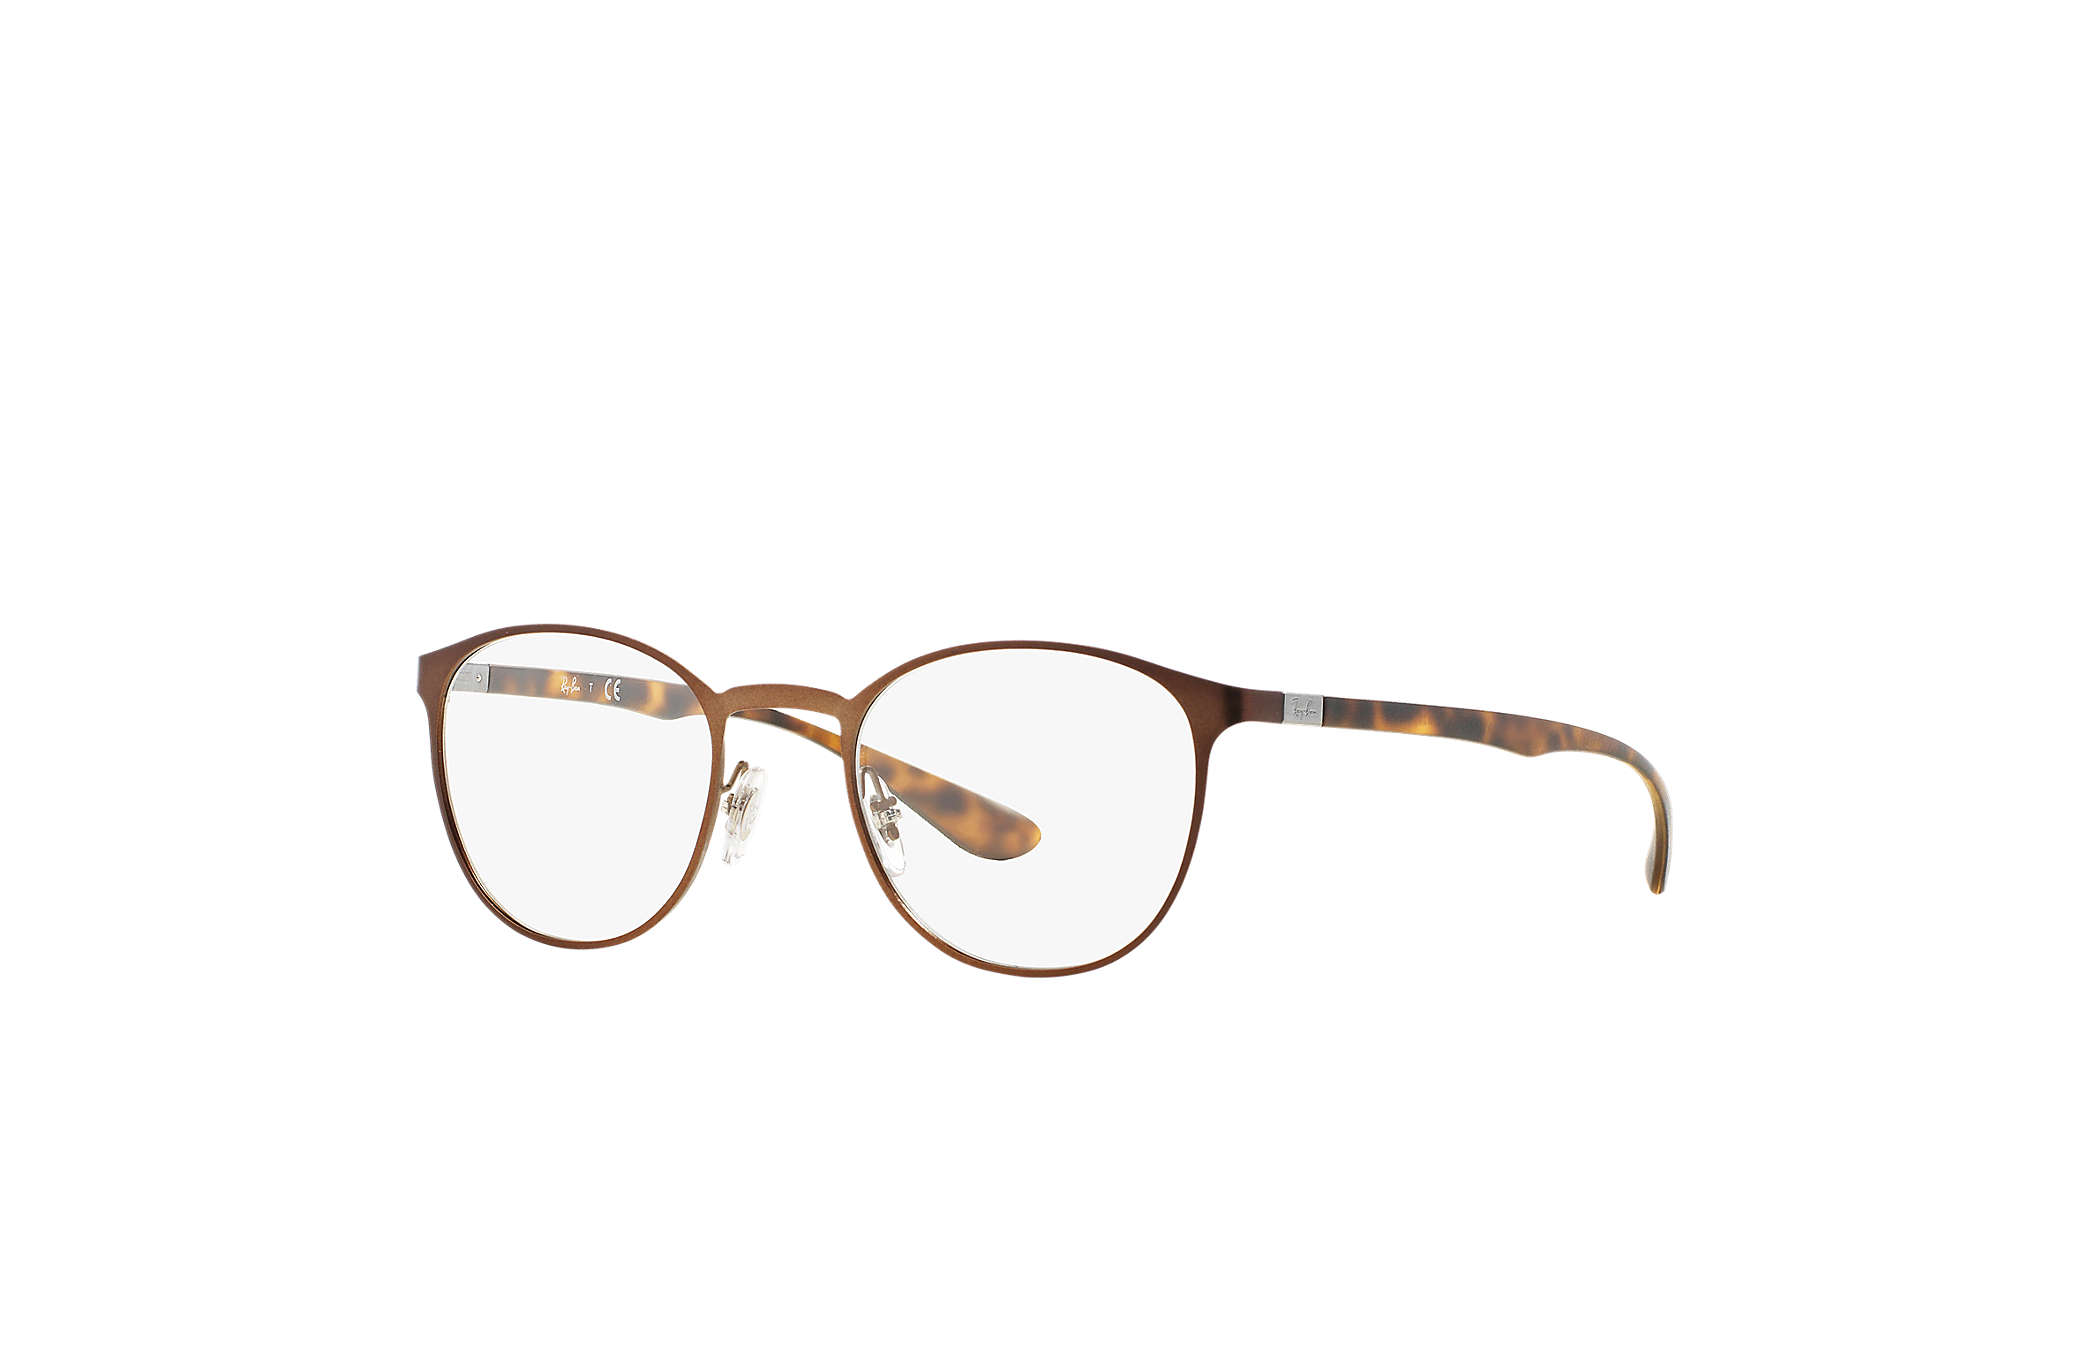 d841f65374 Ray-Ban prescription glasses RB6355 Brown - Liteforce ...